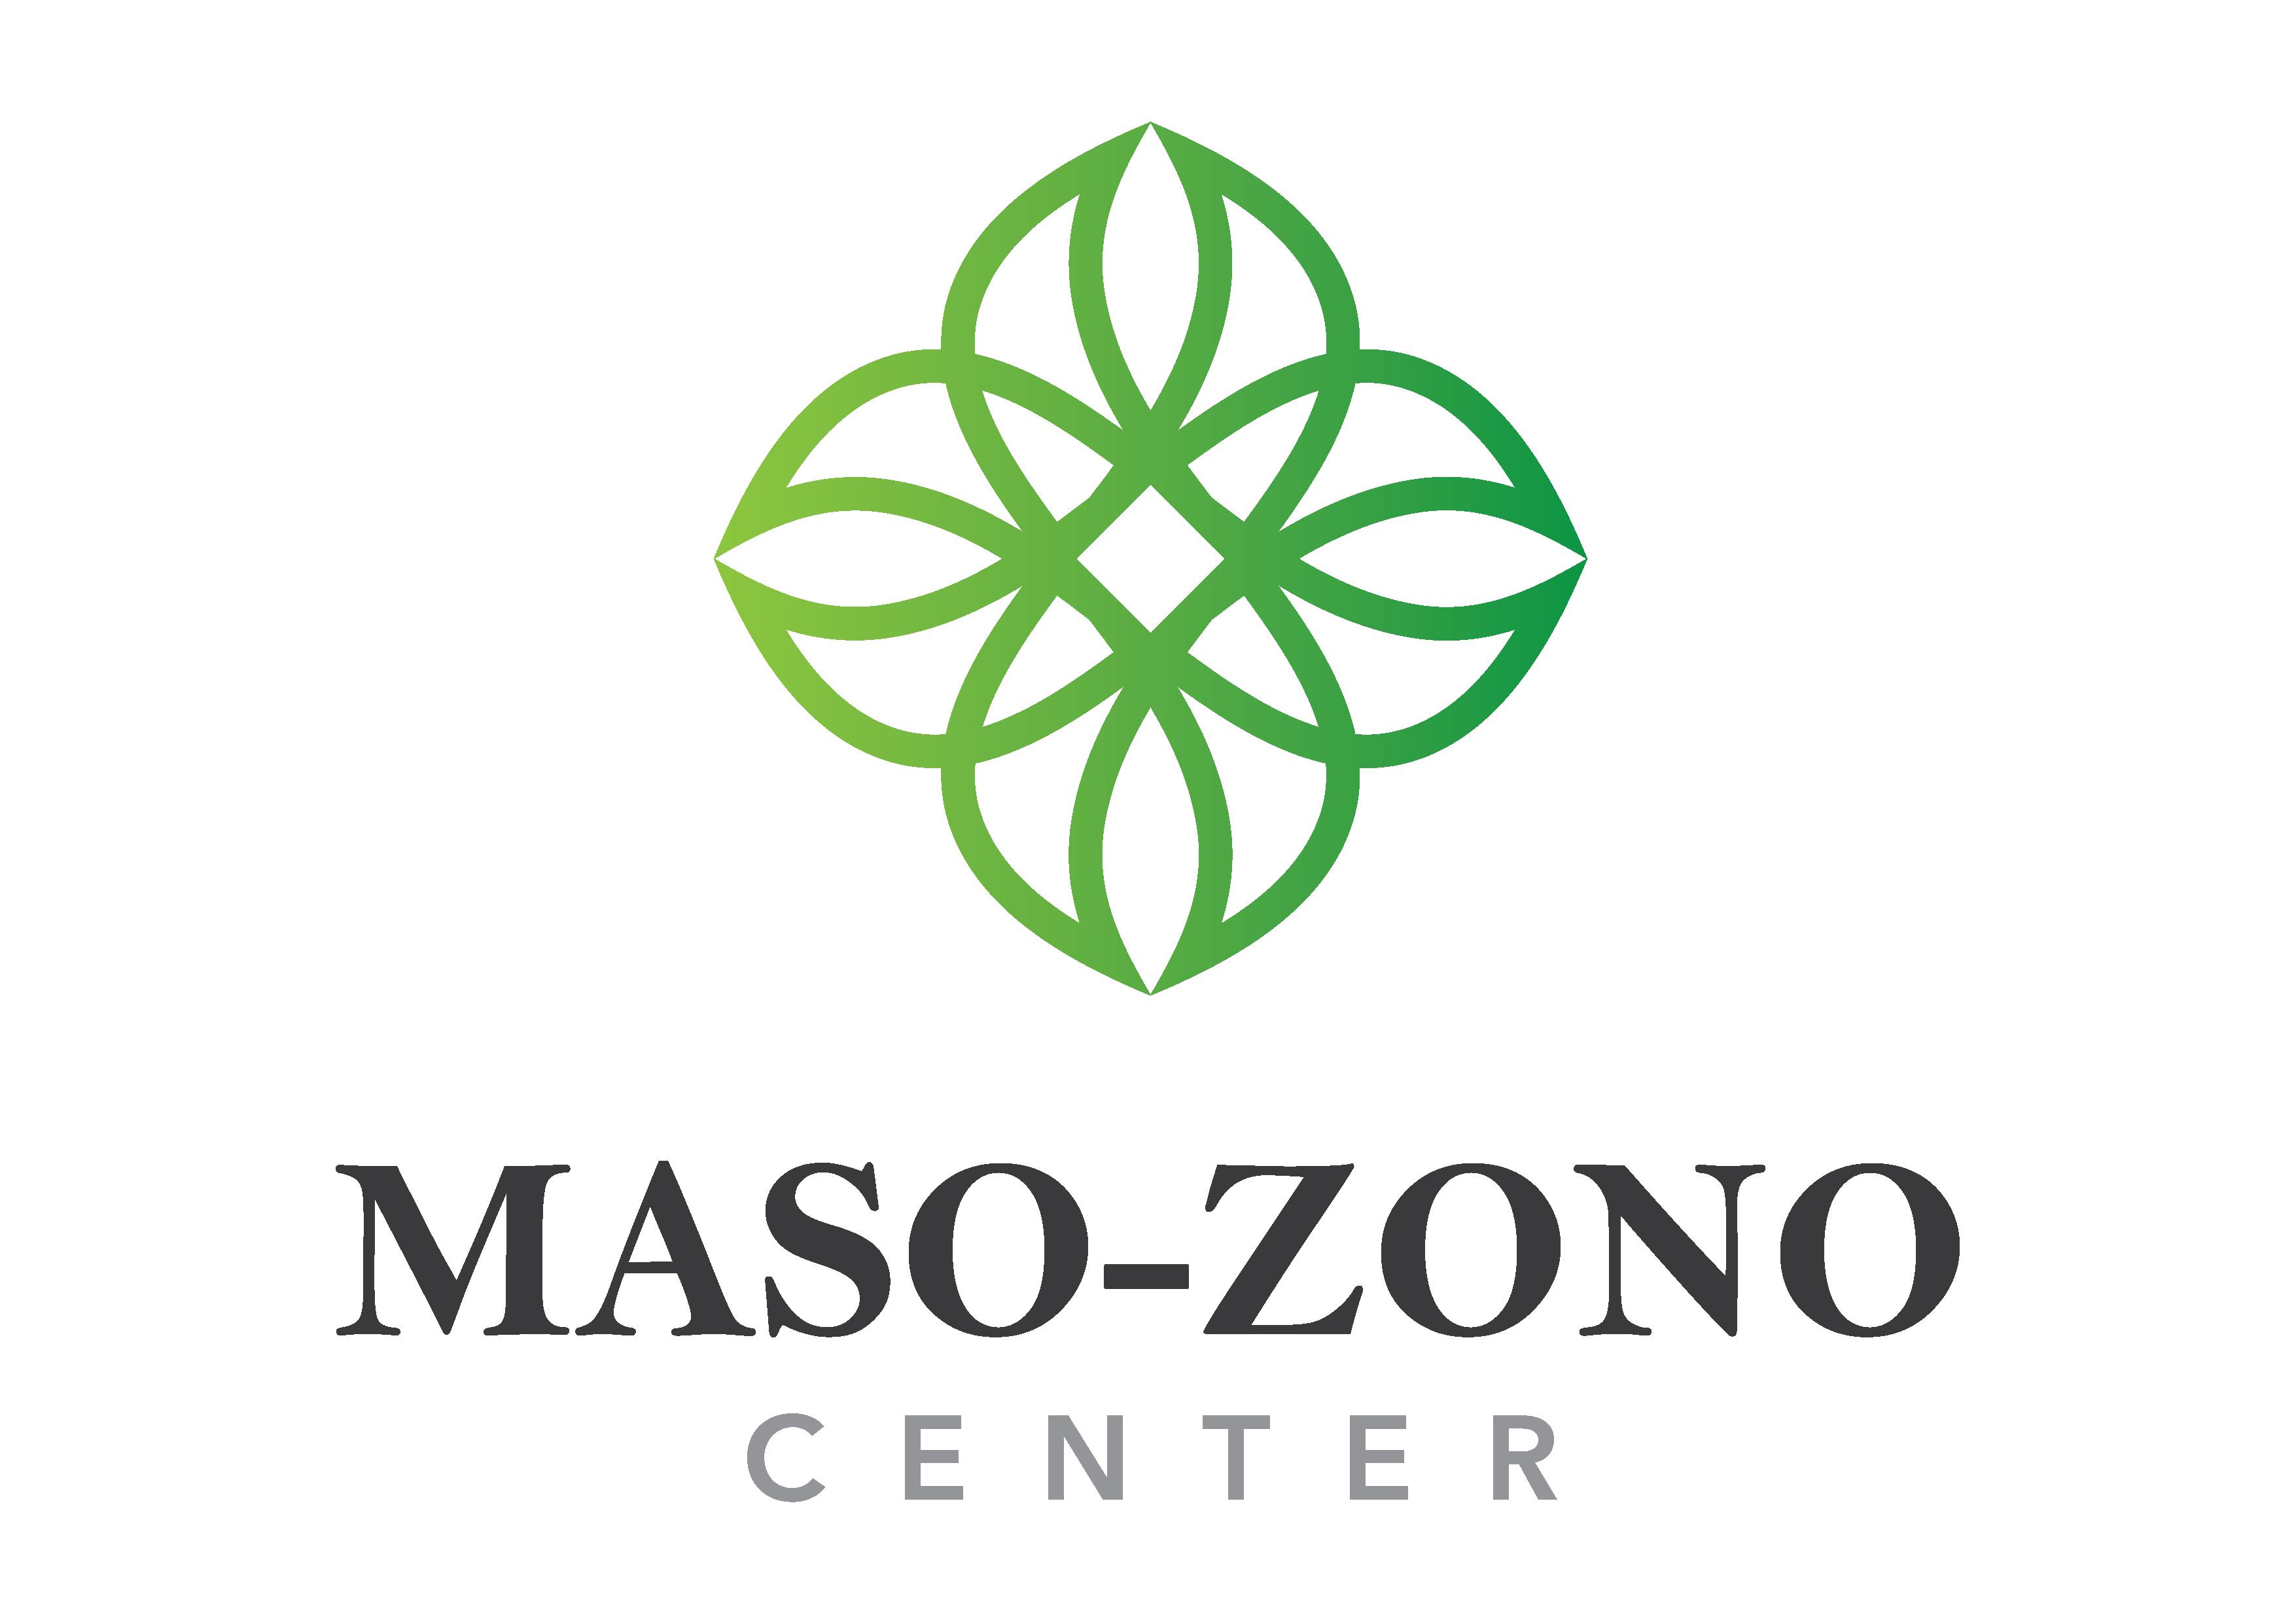 Maso Zono Center